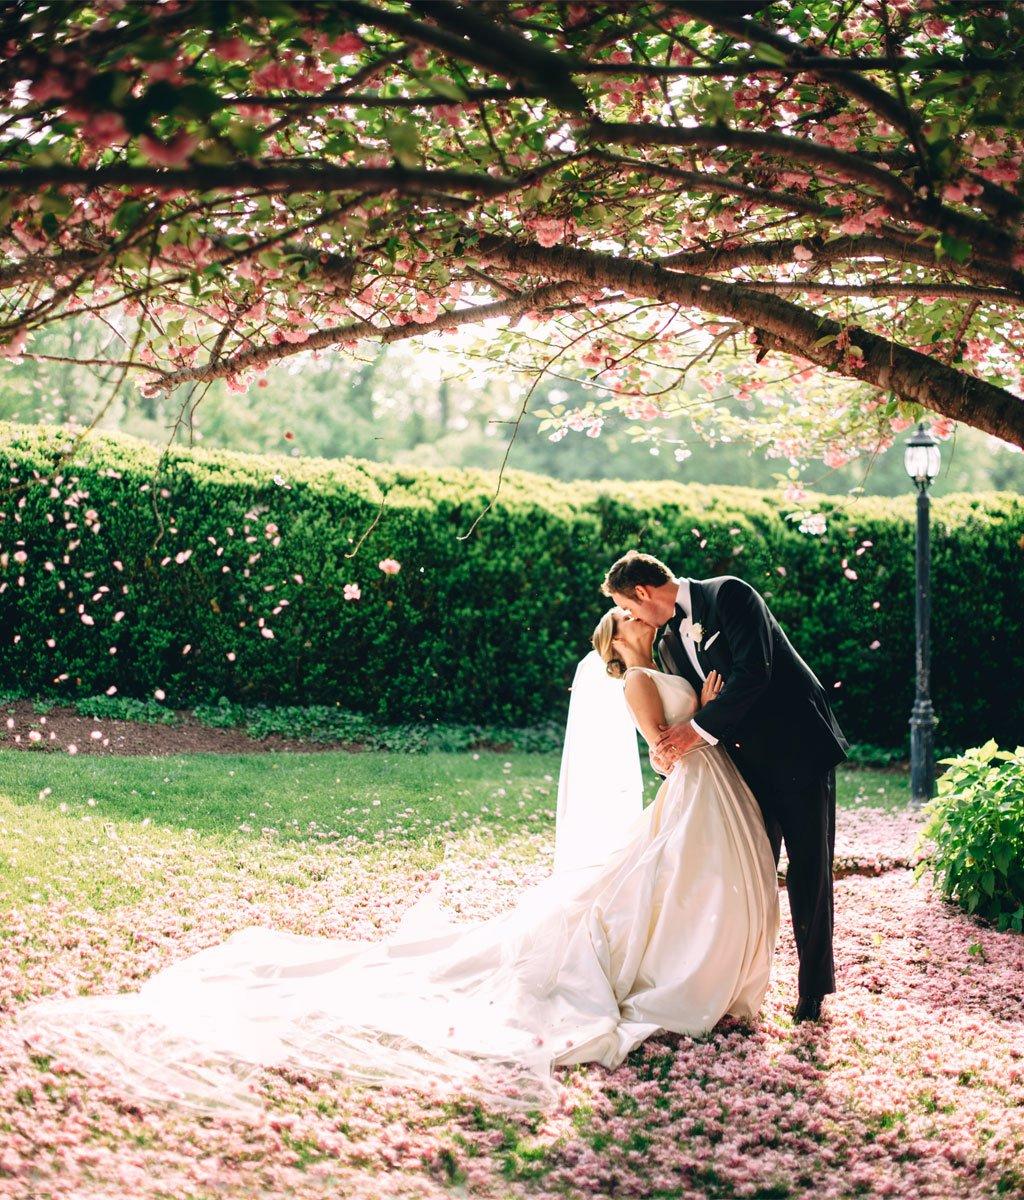 11-2-16-antrim-1844-blue-gold-wedding-12